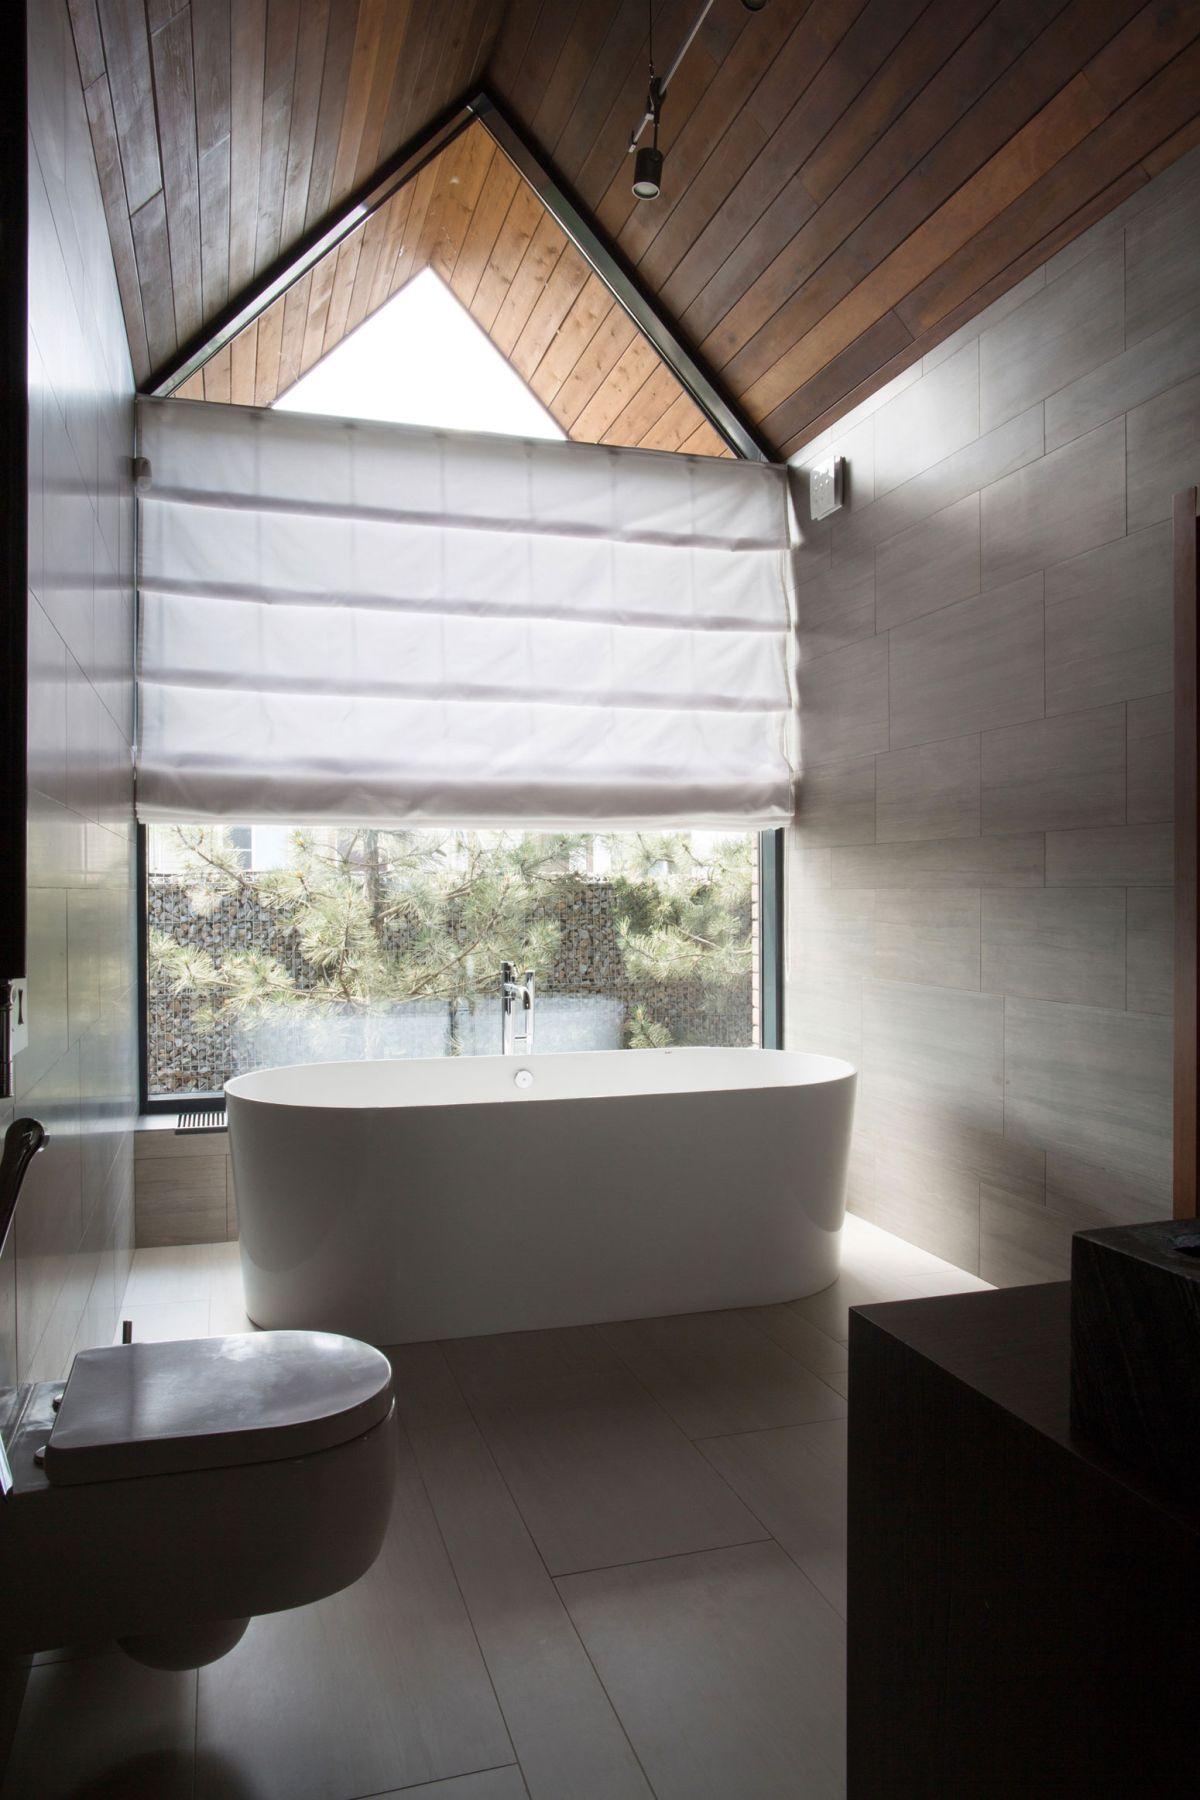 casa simétrica en rostov - baño moderno